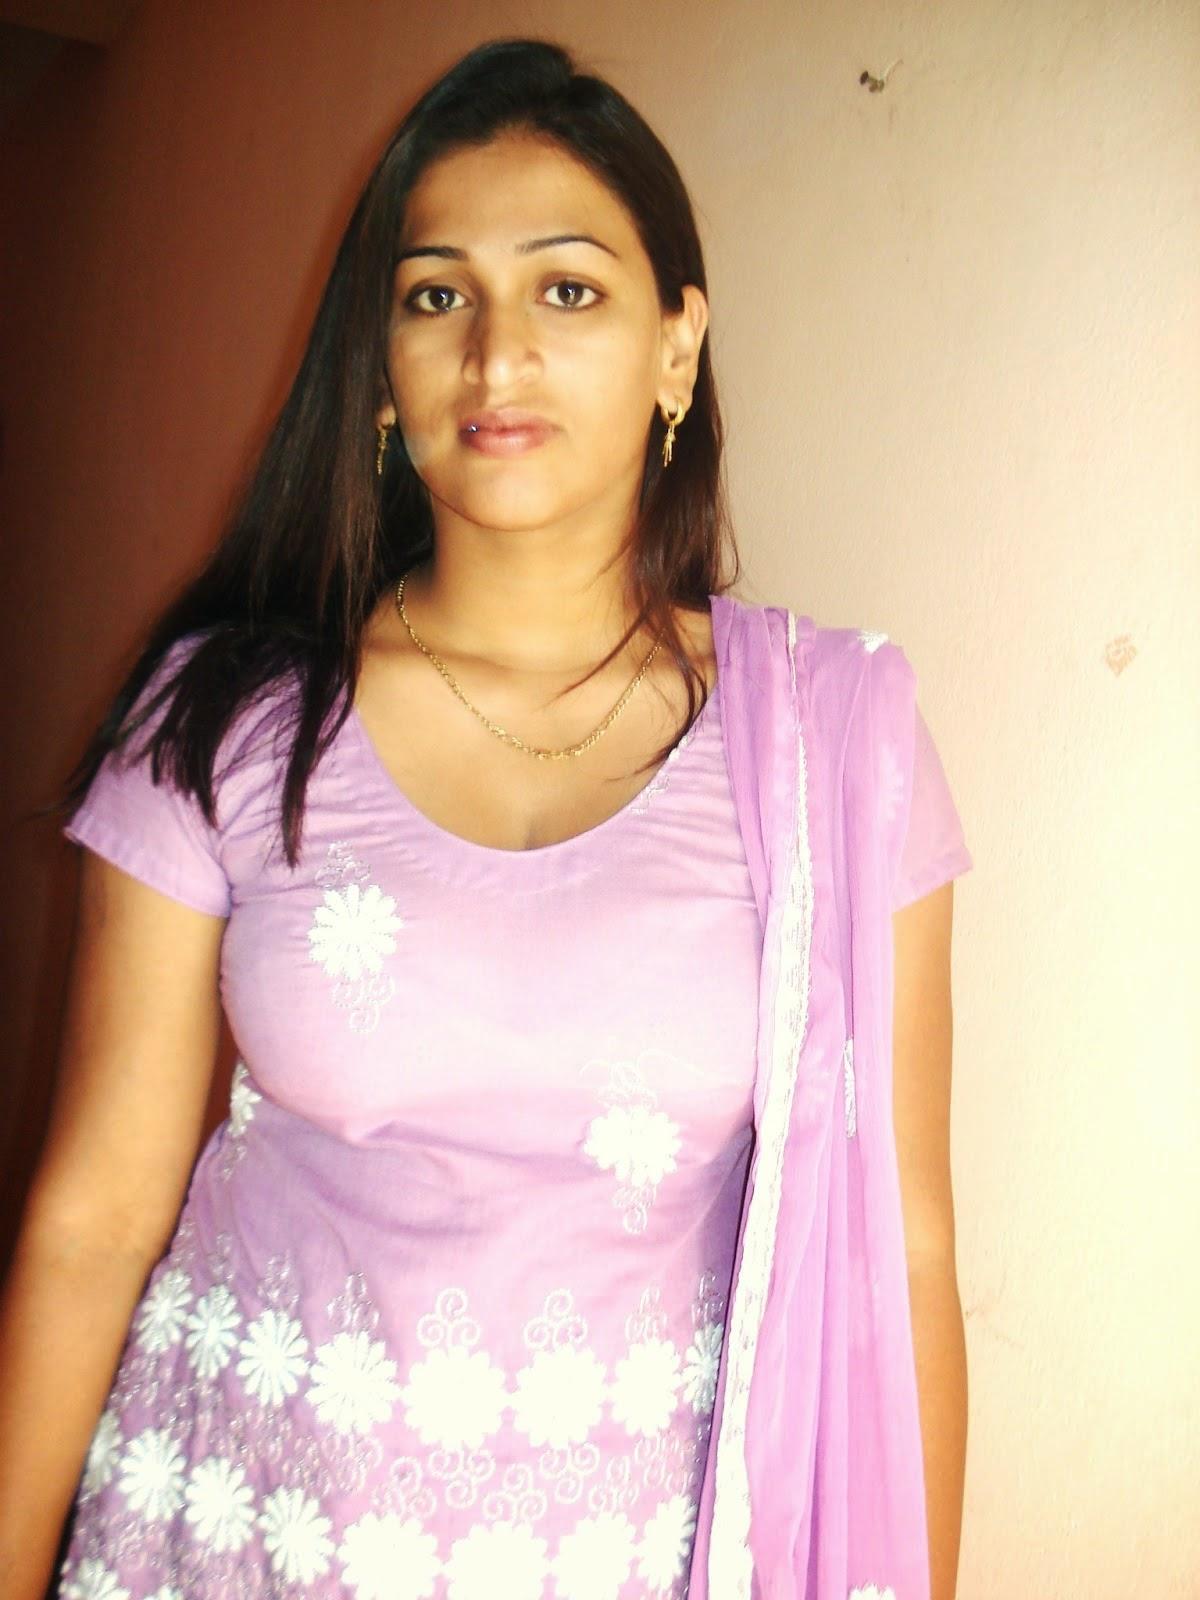 from Kalel marathi dating websites